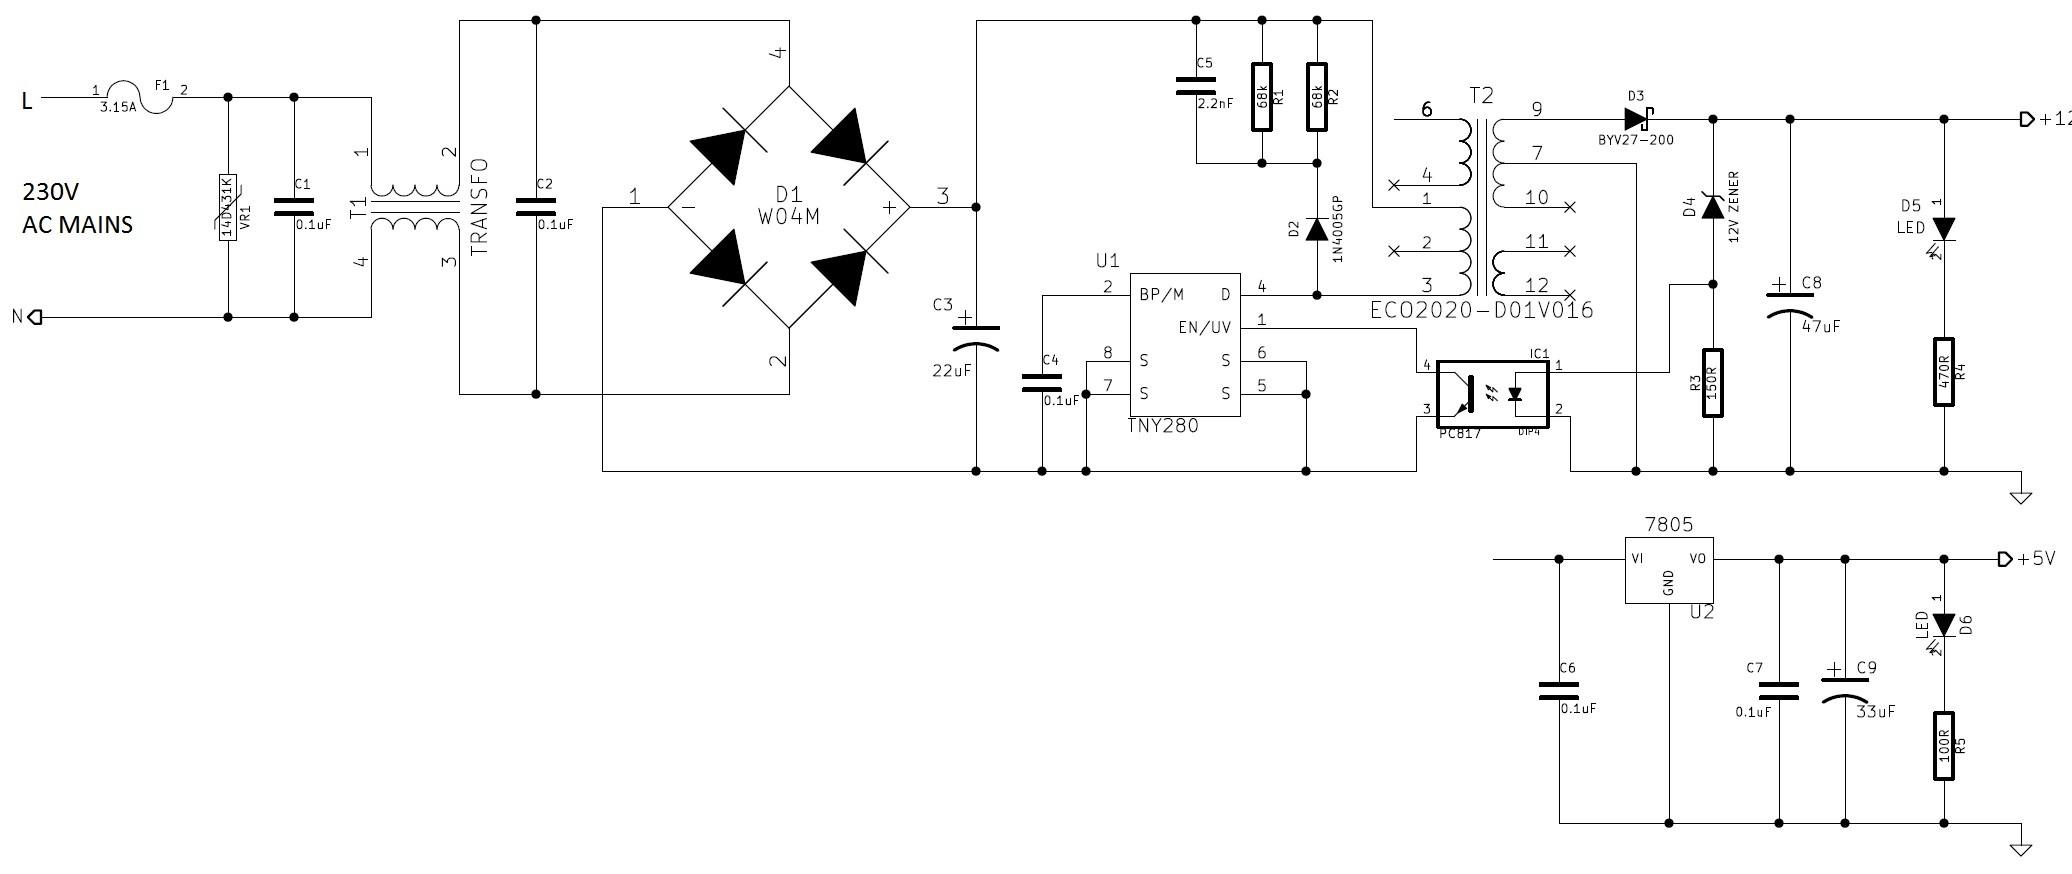 overflow detection circuit